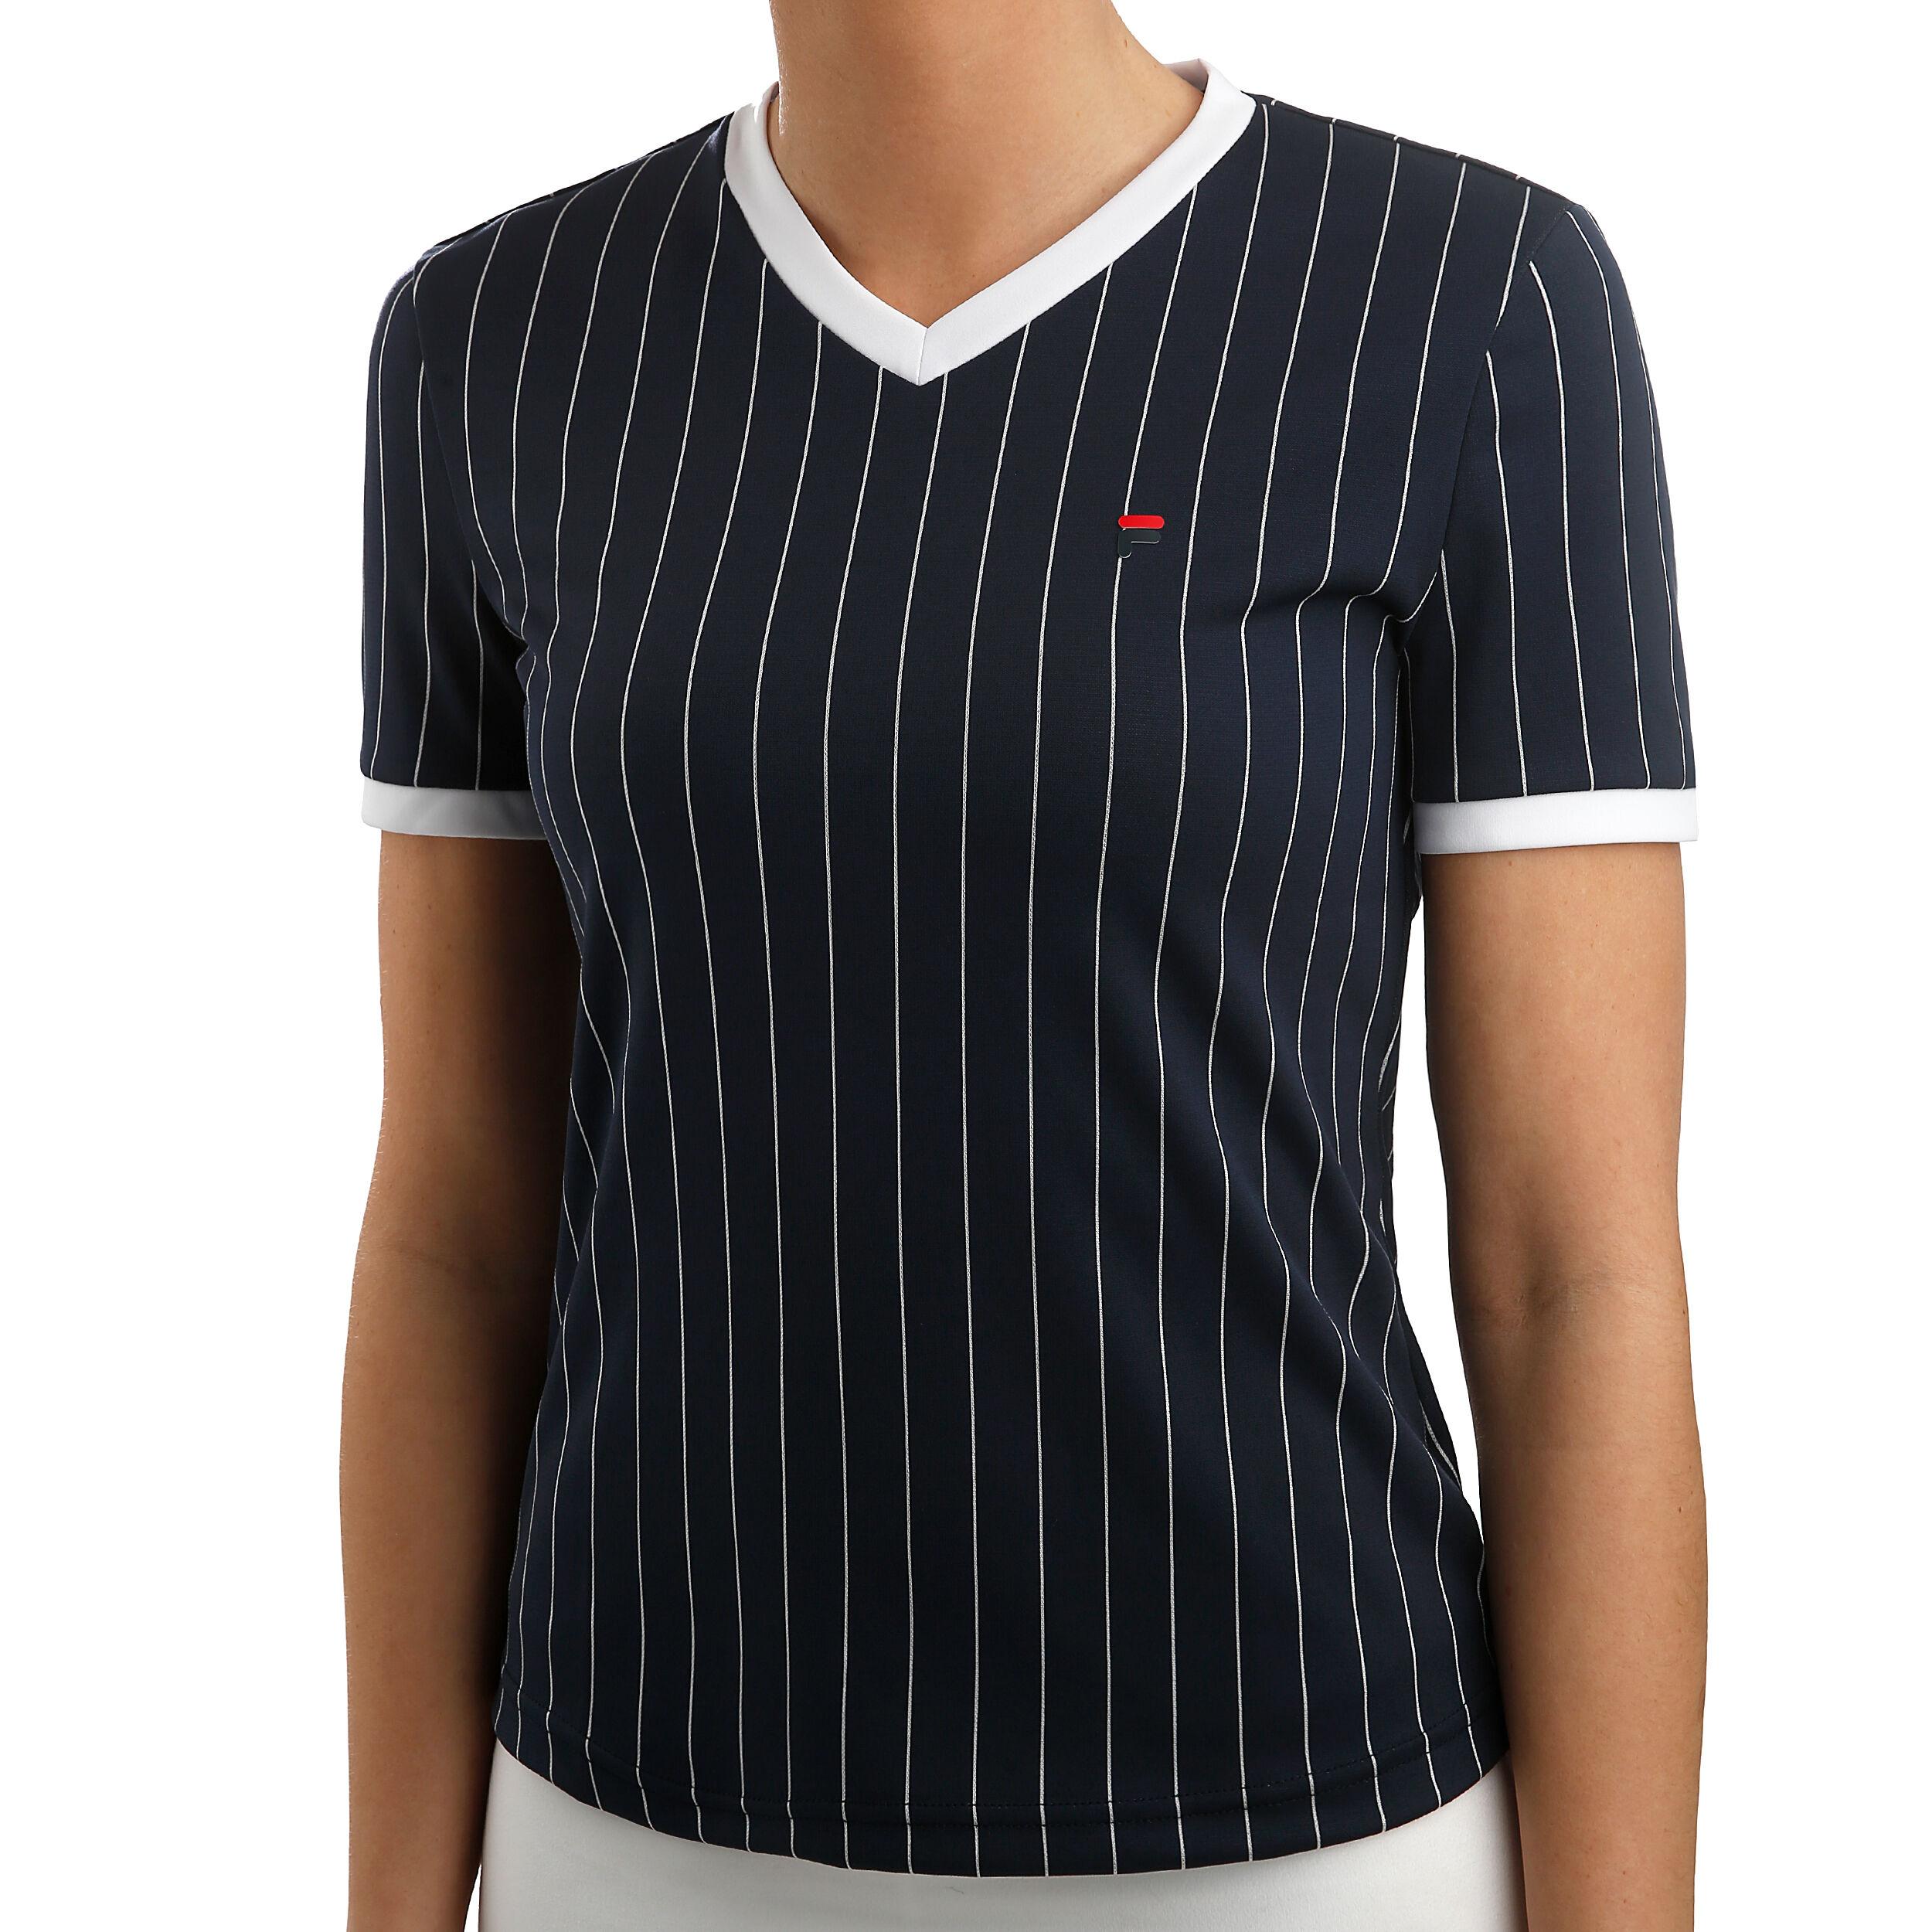 Fila Pearl T shirt Damer Mörkblå, Vit köp online | Tennis